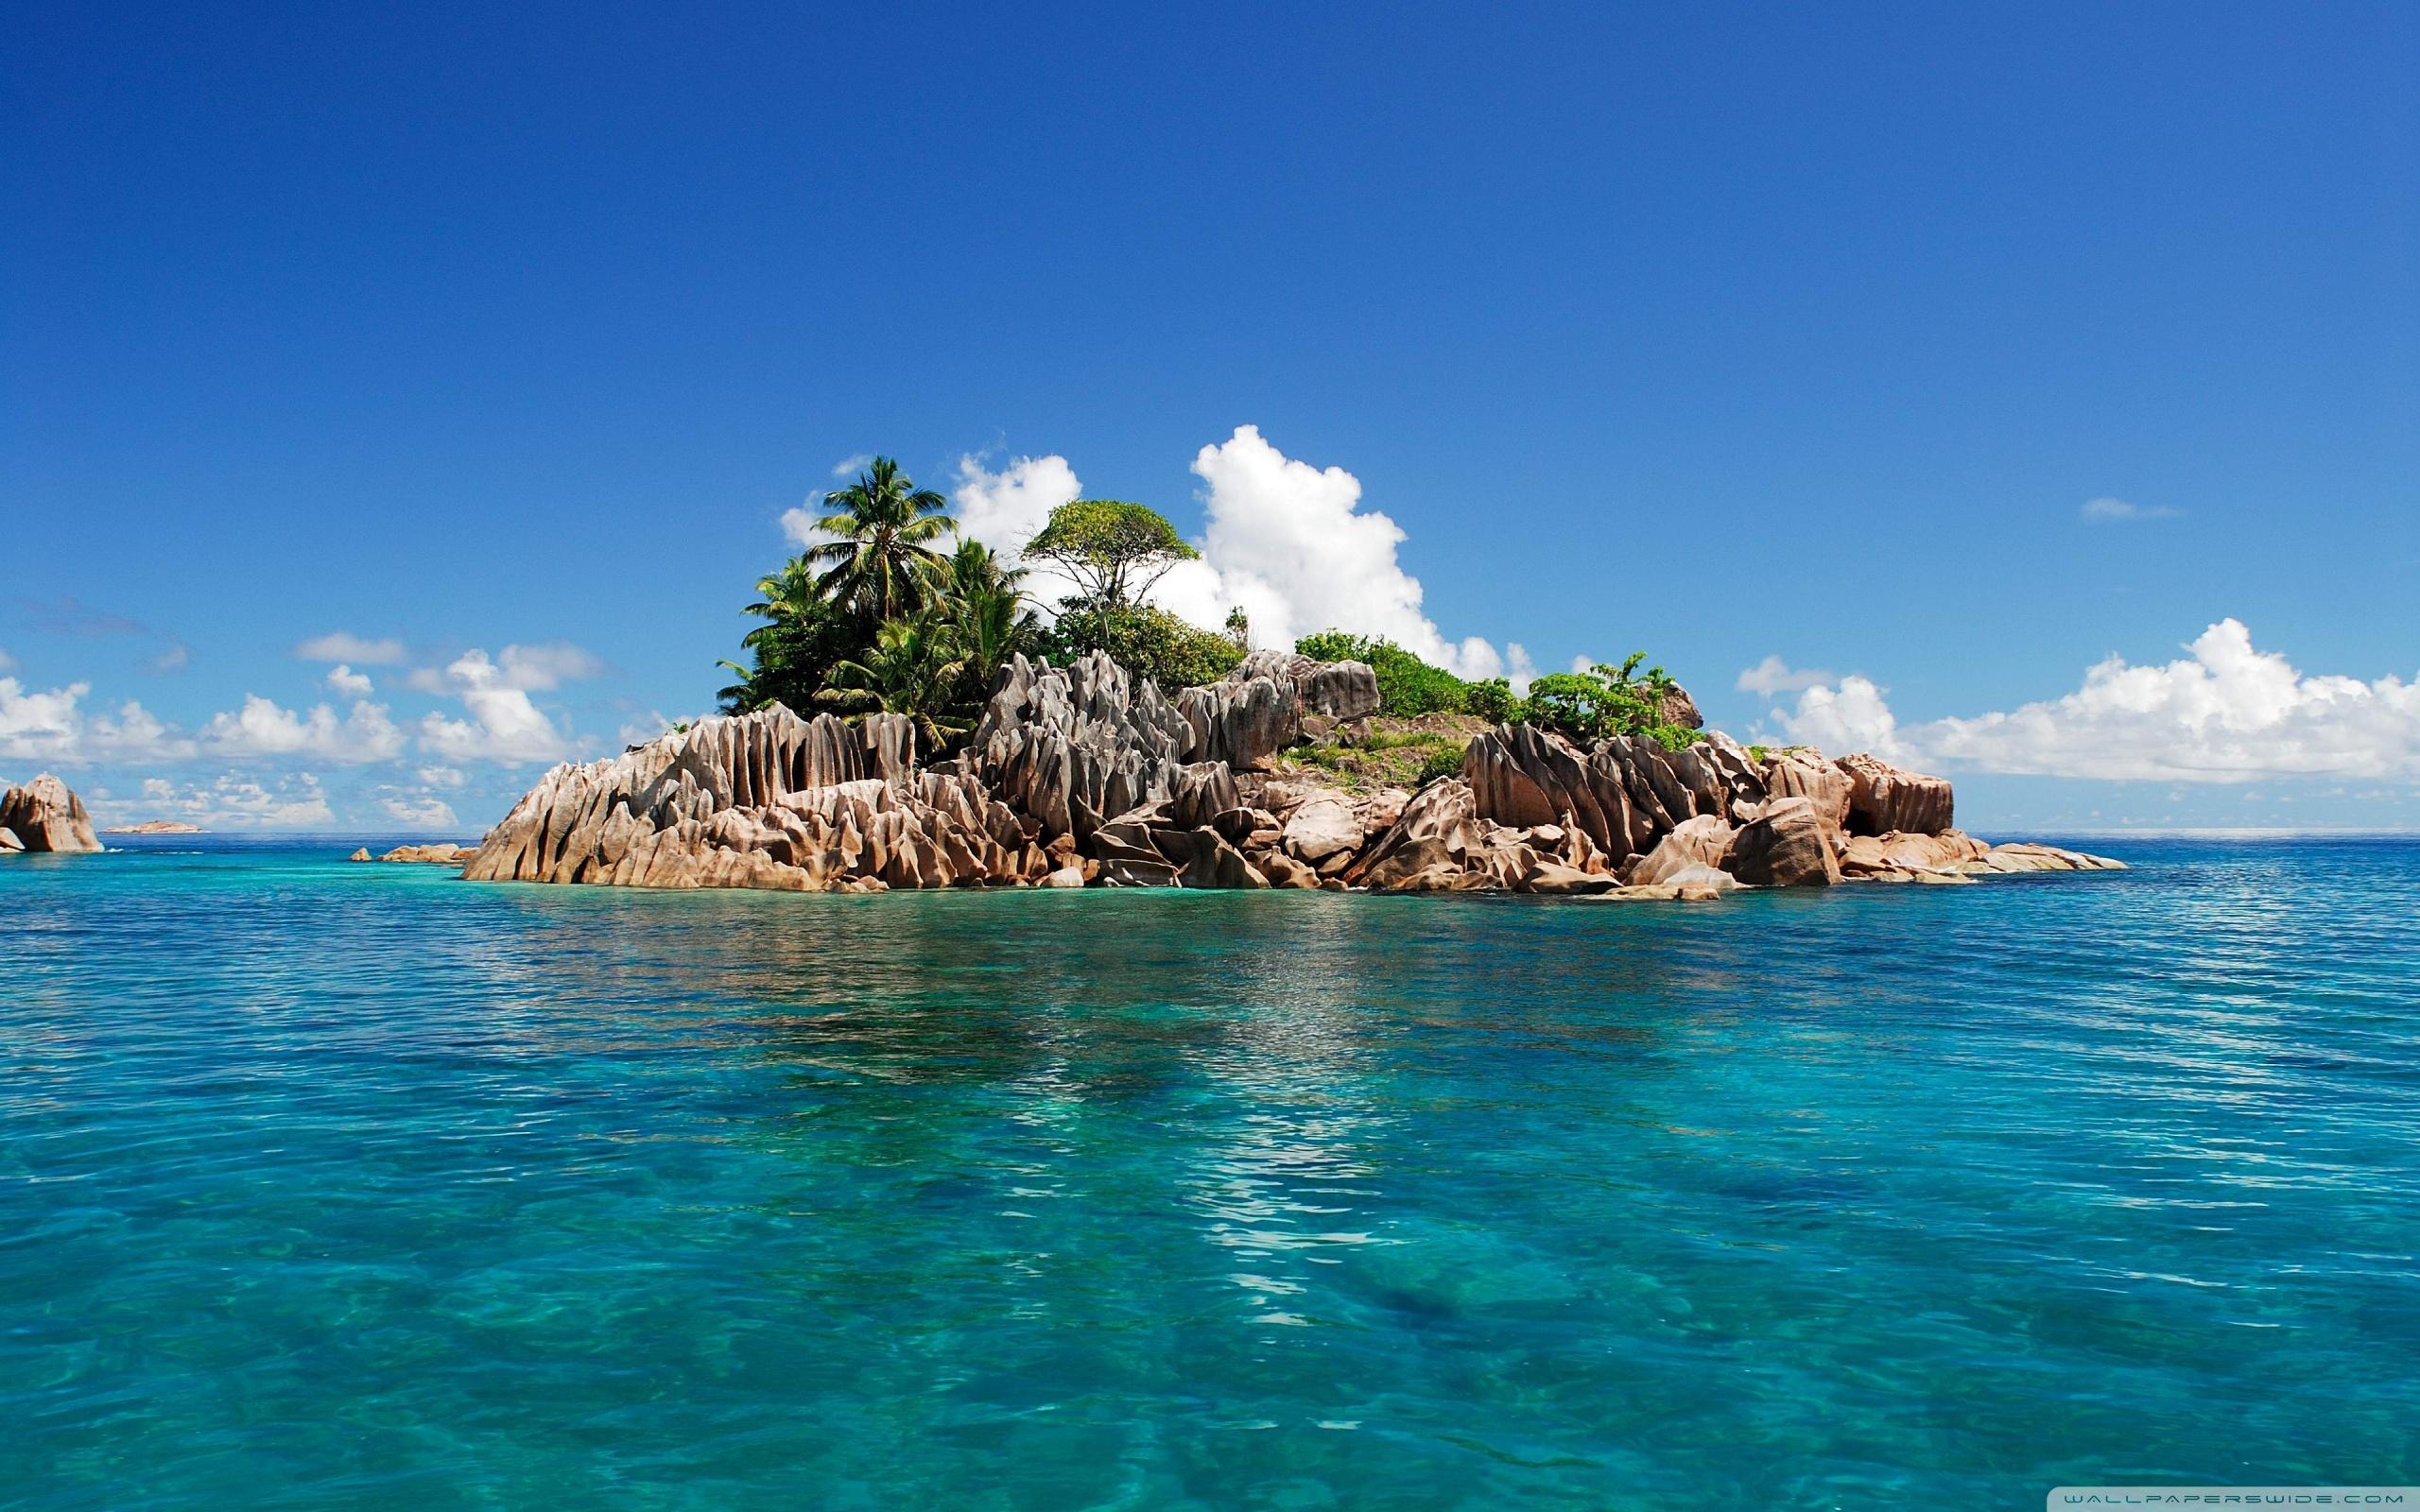 Island HD wallpapers, Desktop wallpaper - most viewed